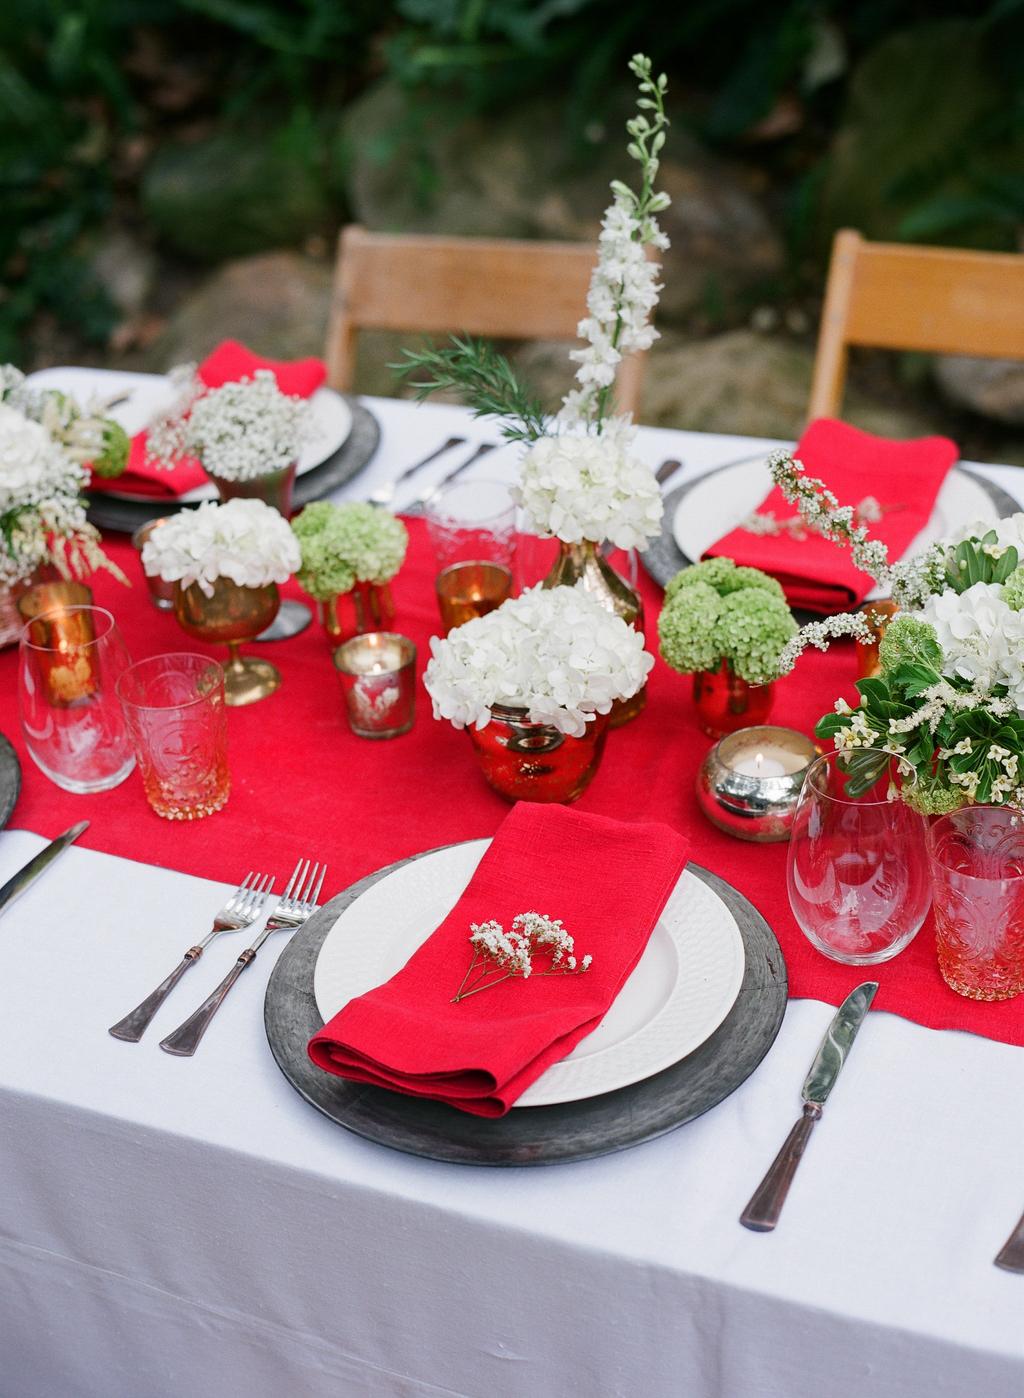 Styled-wedding-santa-barbara-chic-beaux-arts-photographie-italian-bohemian-wedding-venue-table-setting-red-white-flowers-antique-glass-097.full